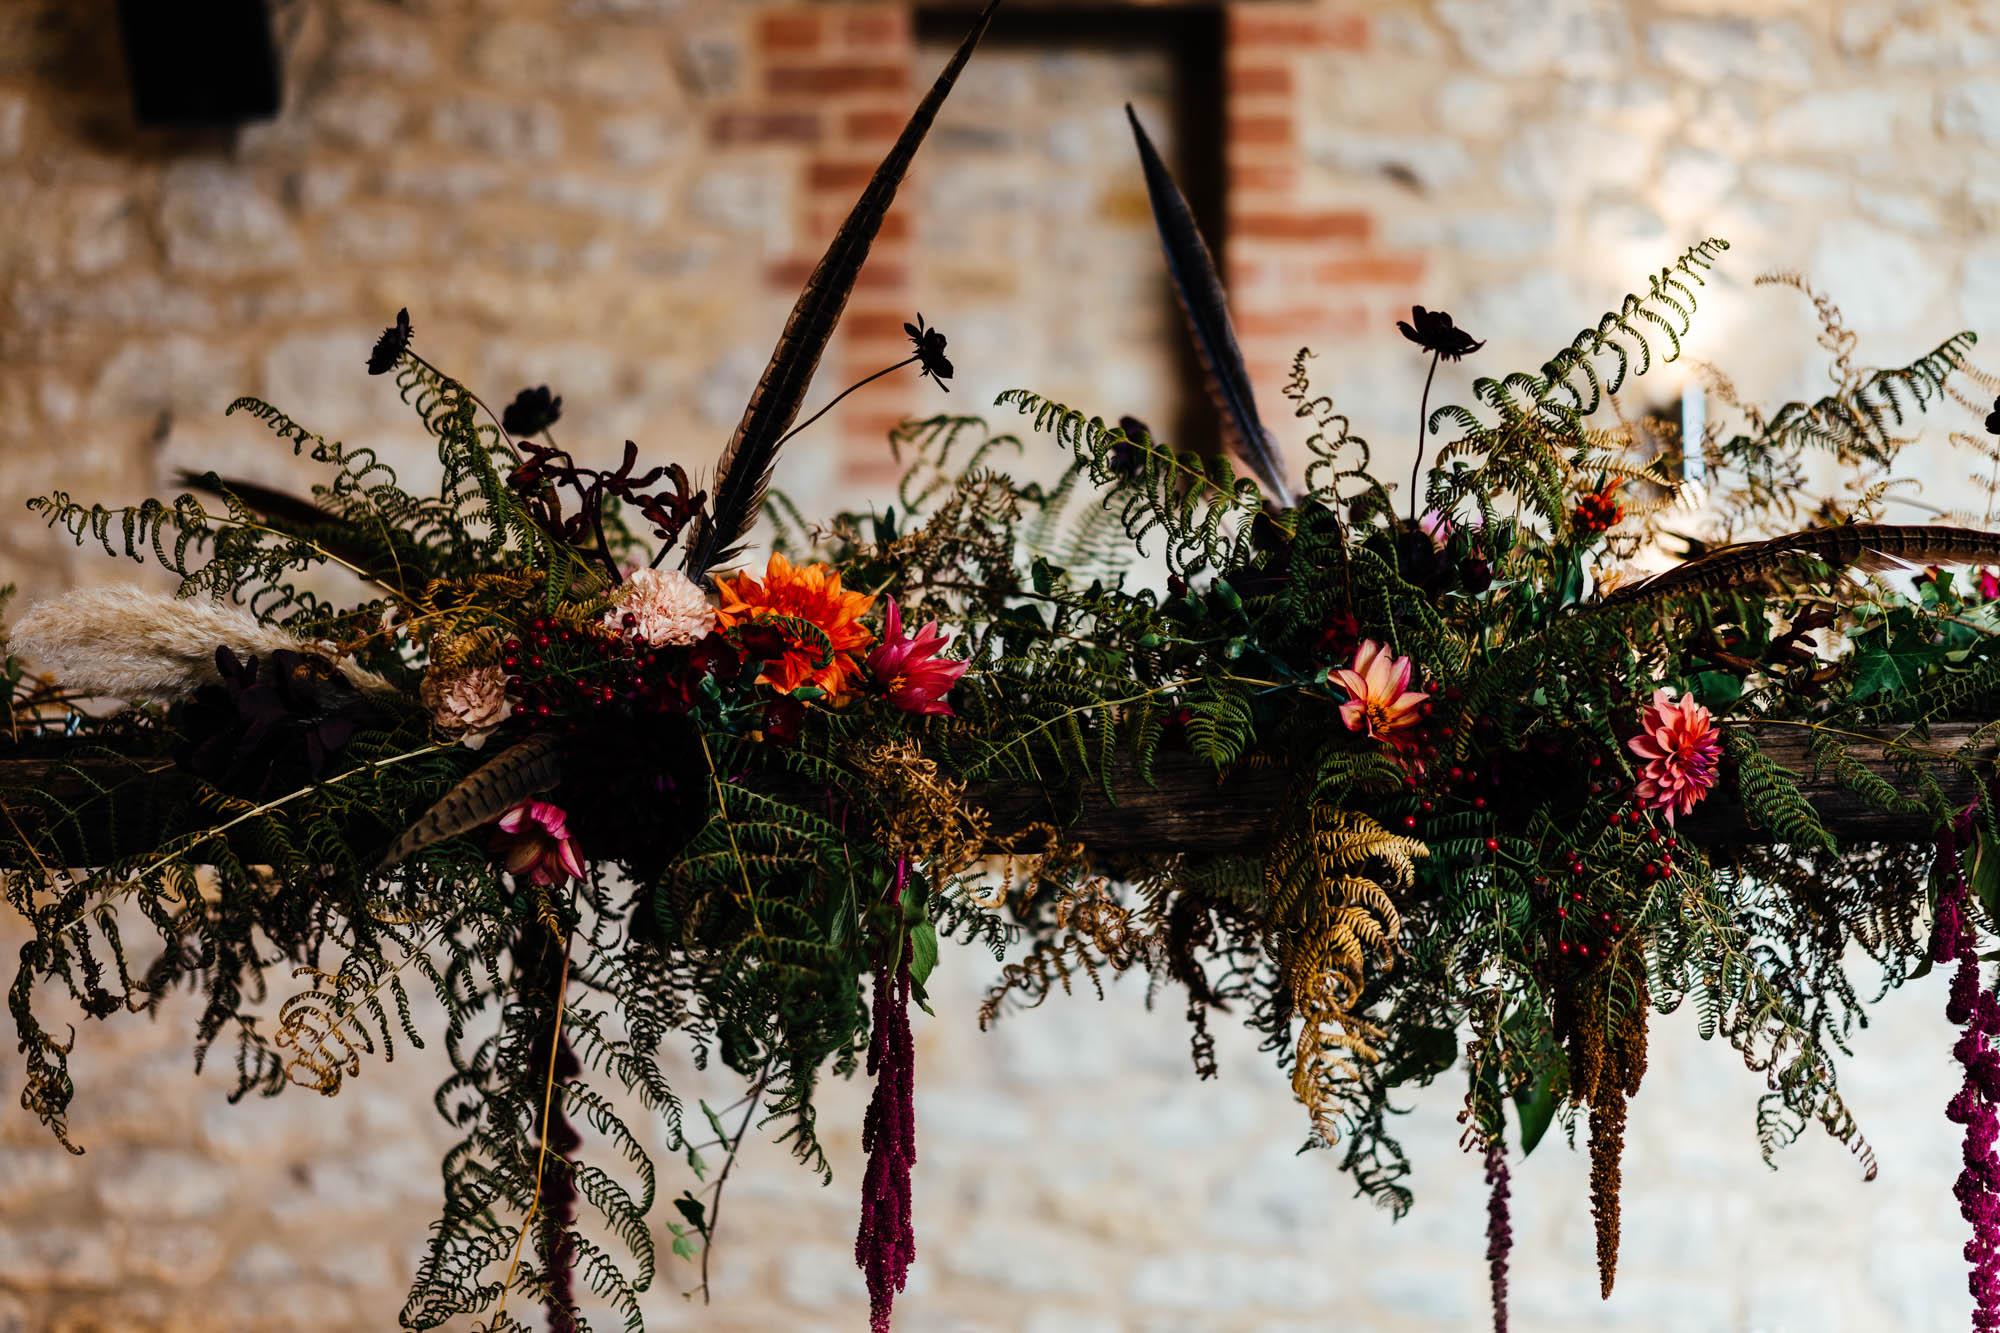 huntsmill-farm-wedding-inspiration-3